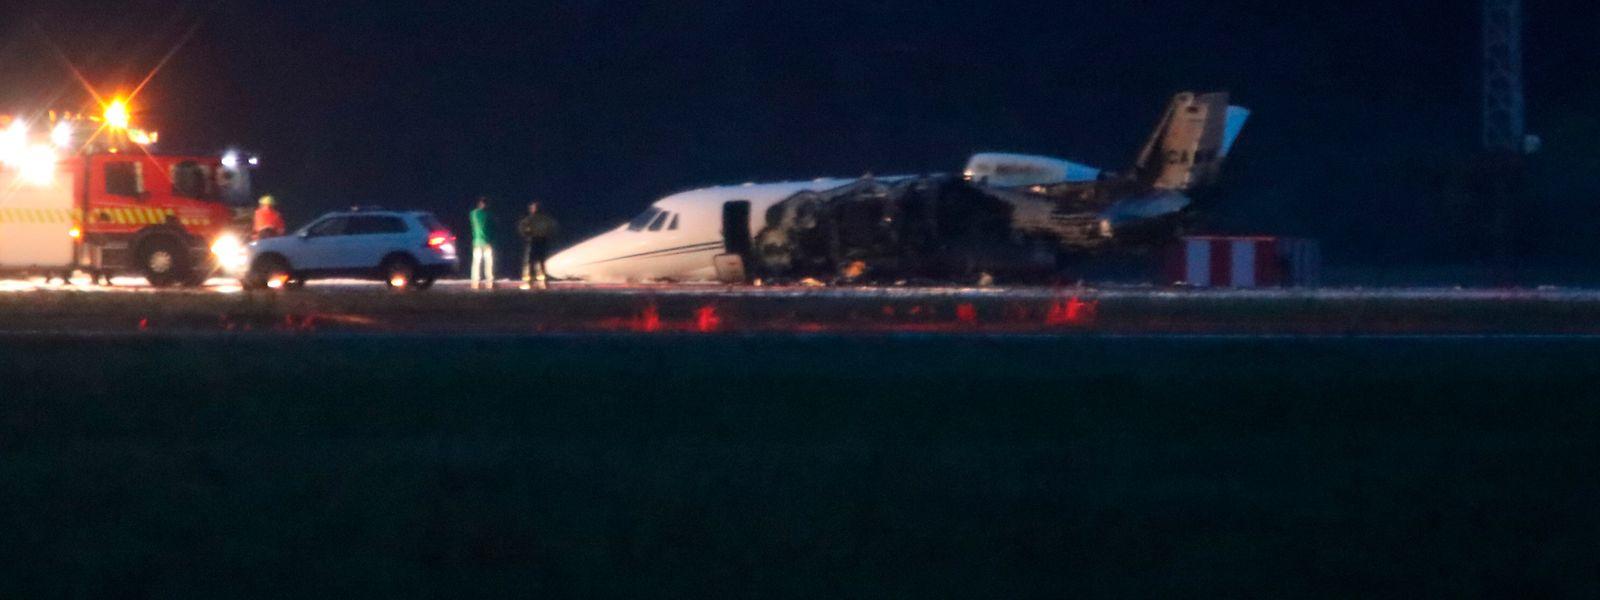 Die Cessna 560XL fing bei der Landung am Flughafen Aarhus Feuer.